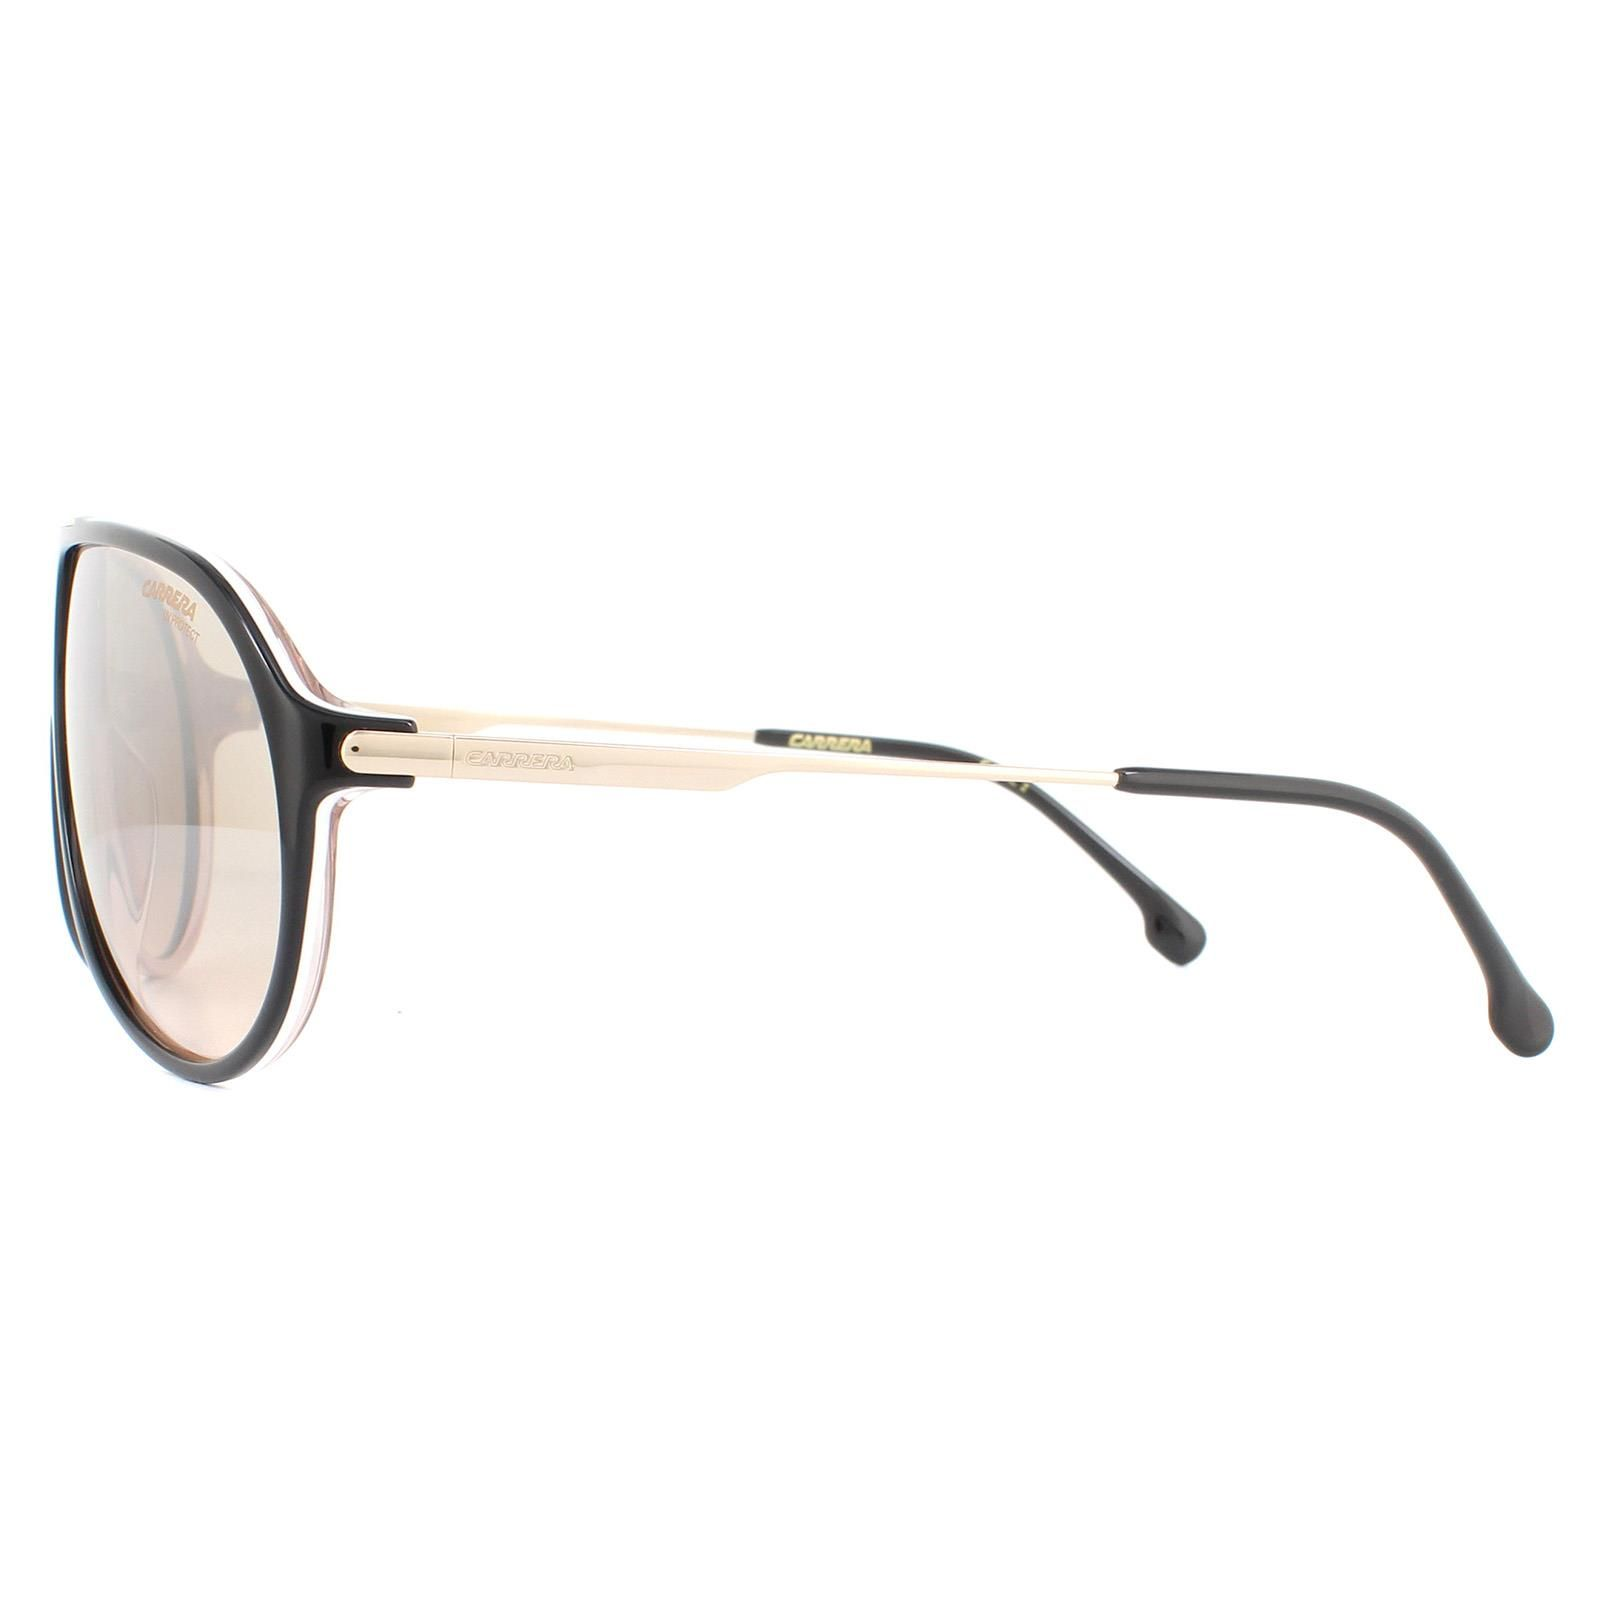 Carrera Sunglasses Hot 65 KDX/G4 Black Nude Brown Mirror